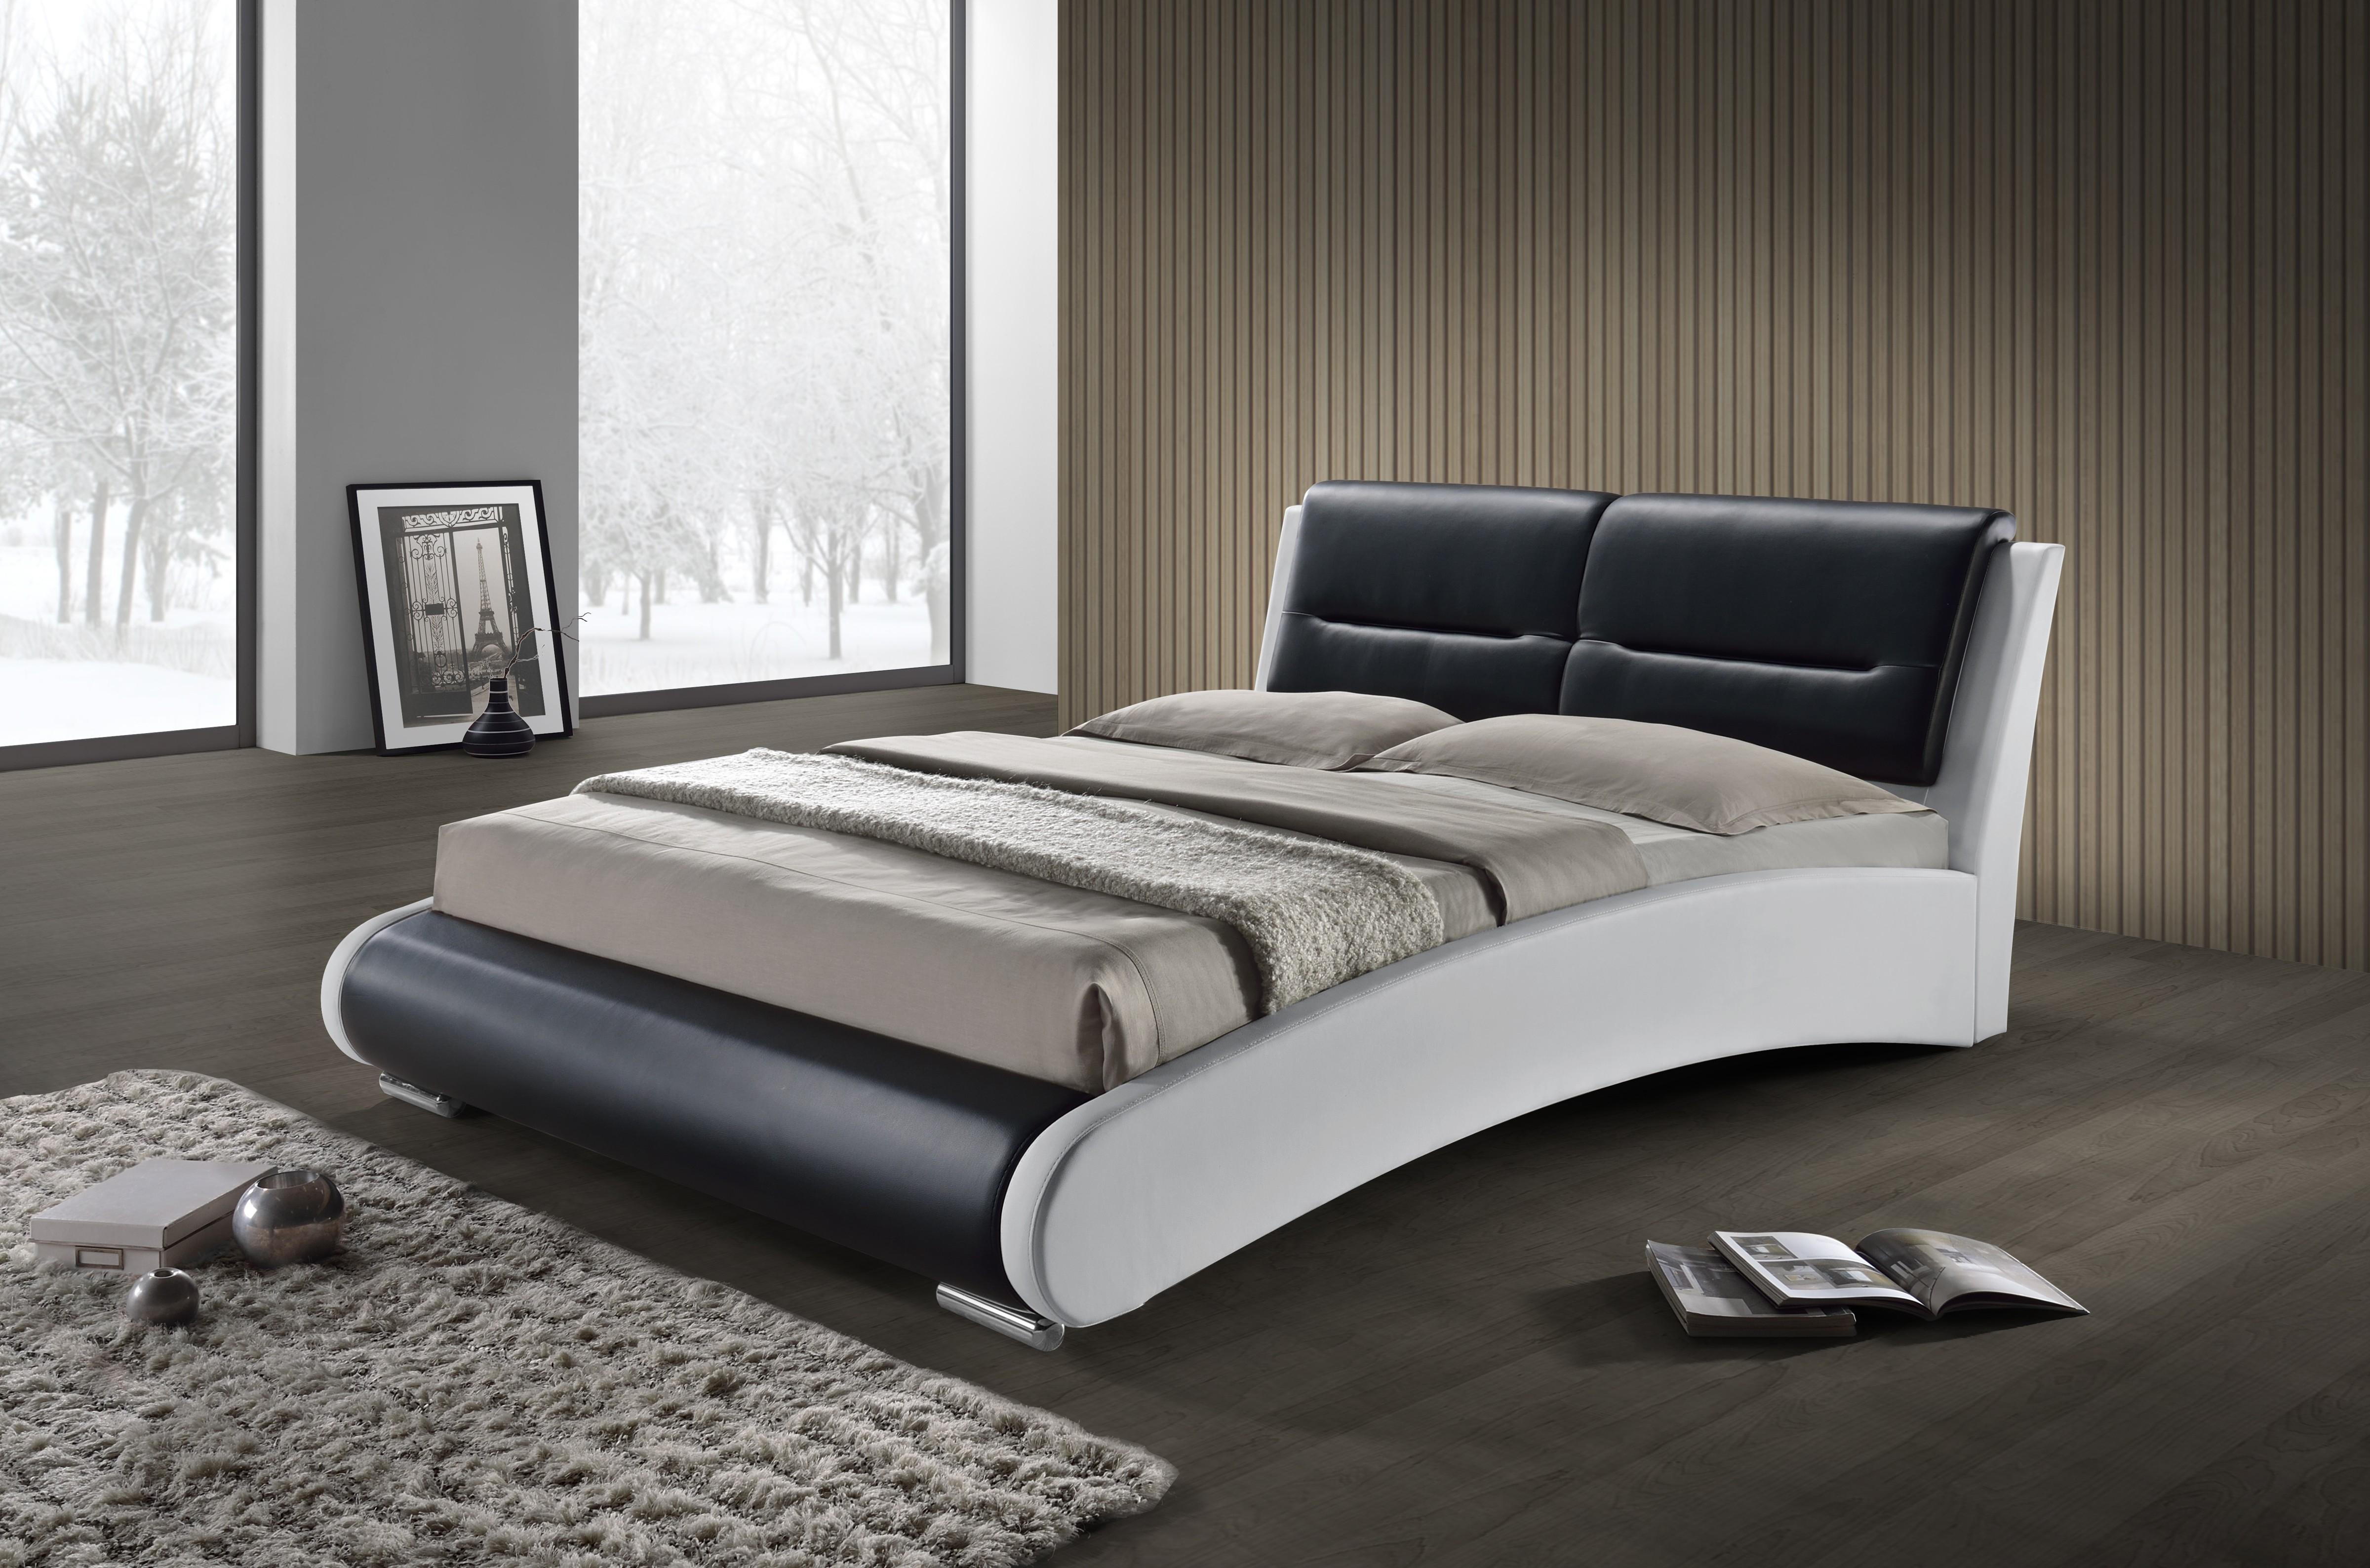 Canapé Convertible Confortable Bultex Inspirant Collection Lit Canapé Gigogne Centralillaw